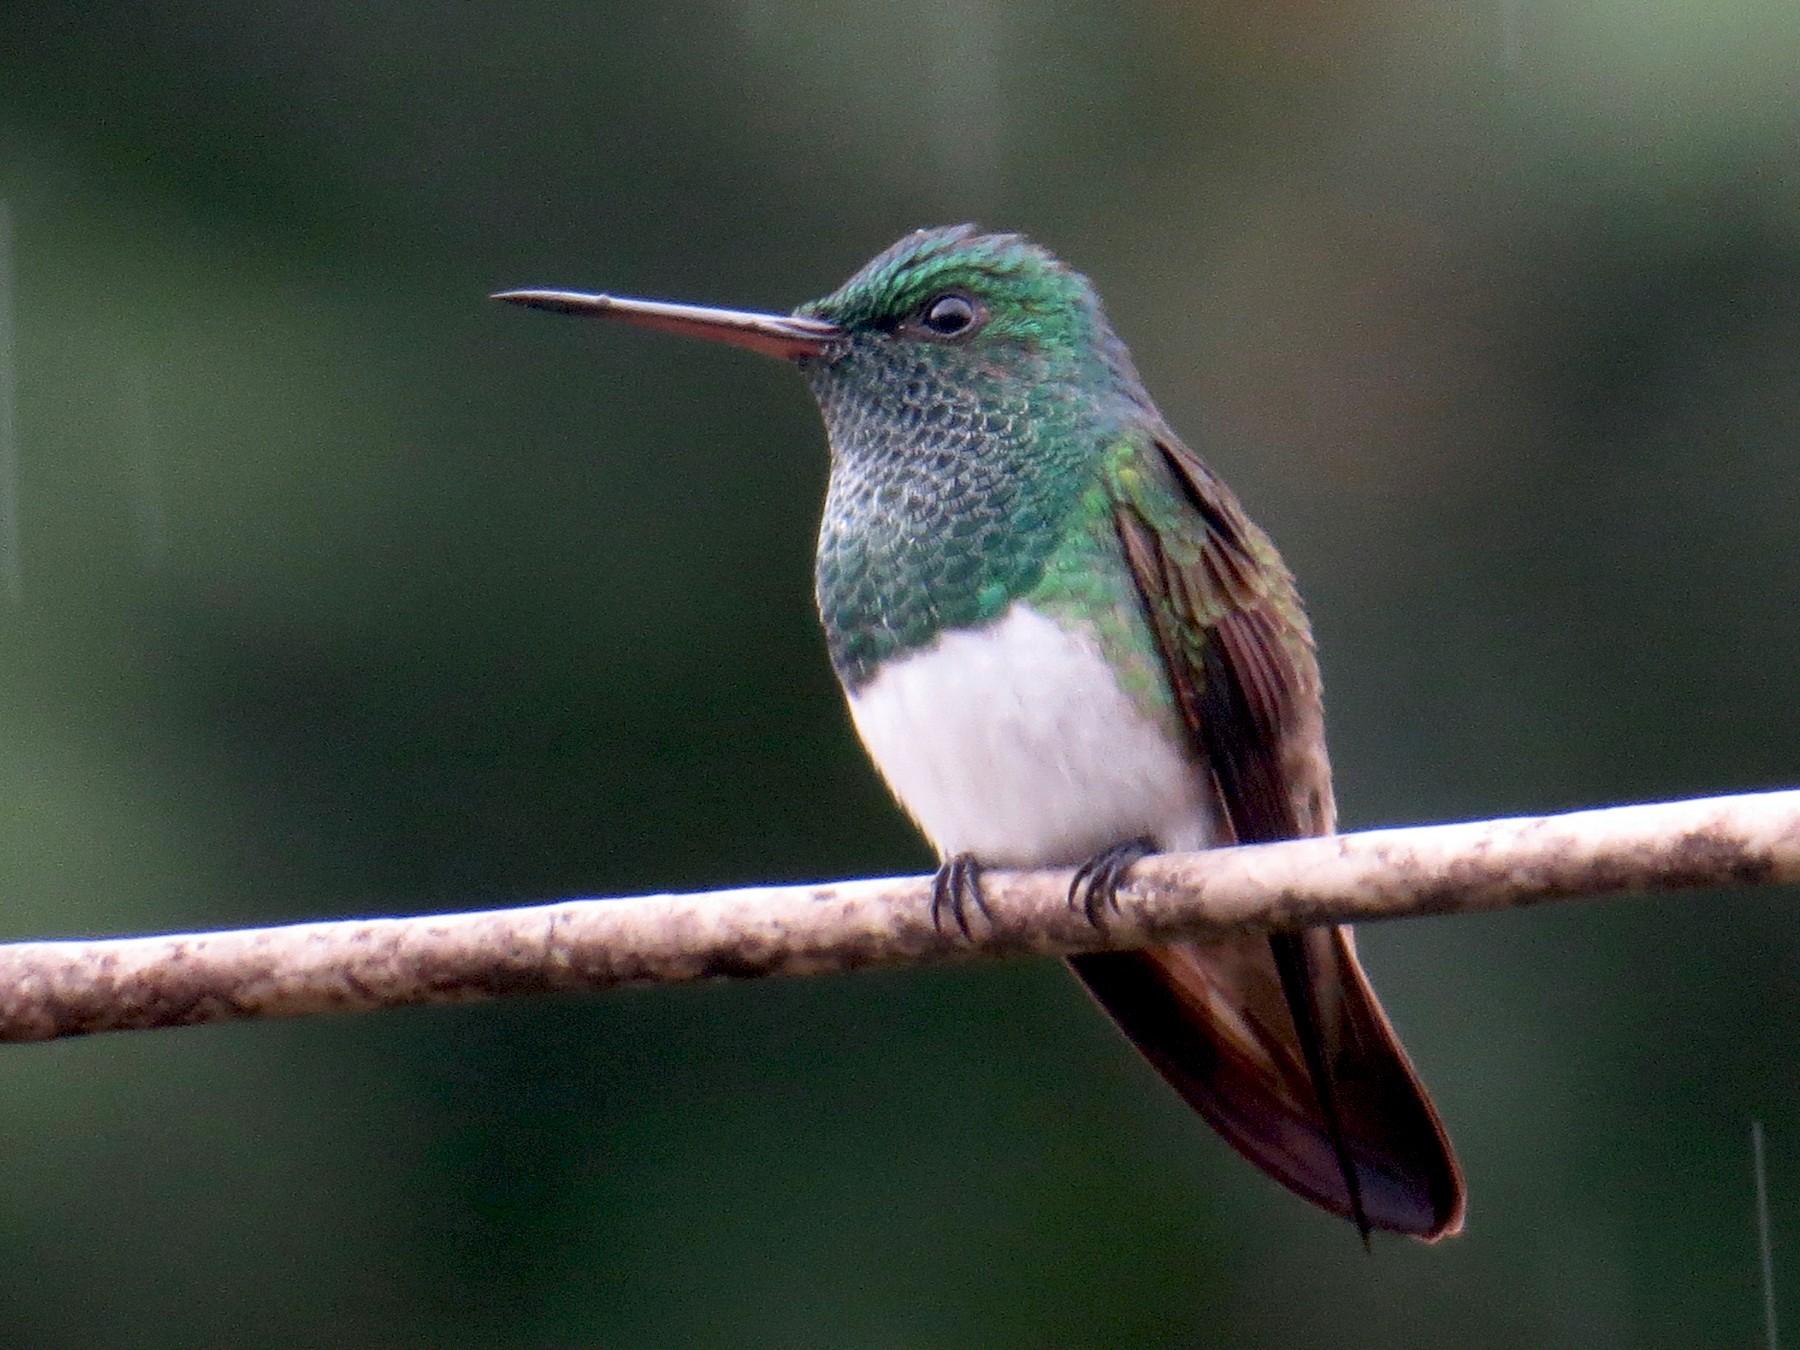 Snowy-bellied Hummingbird - Gerry Hawkins